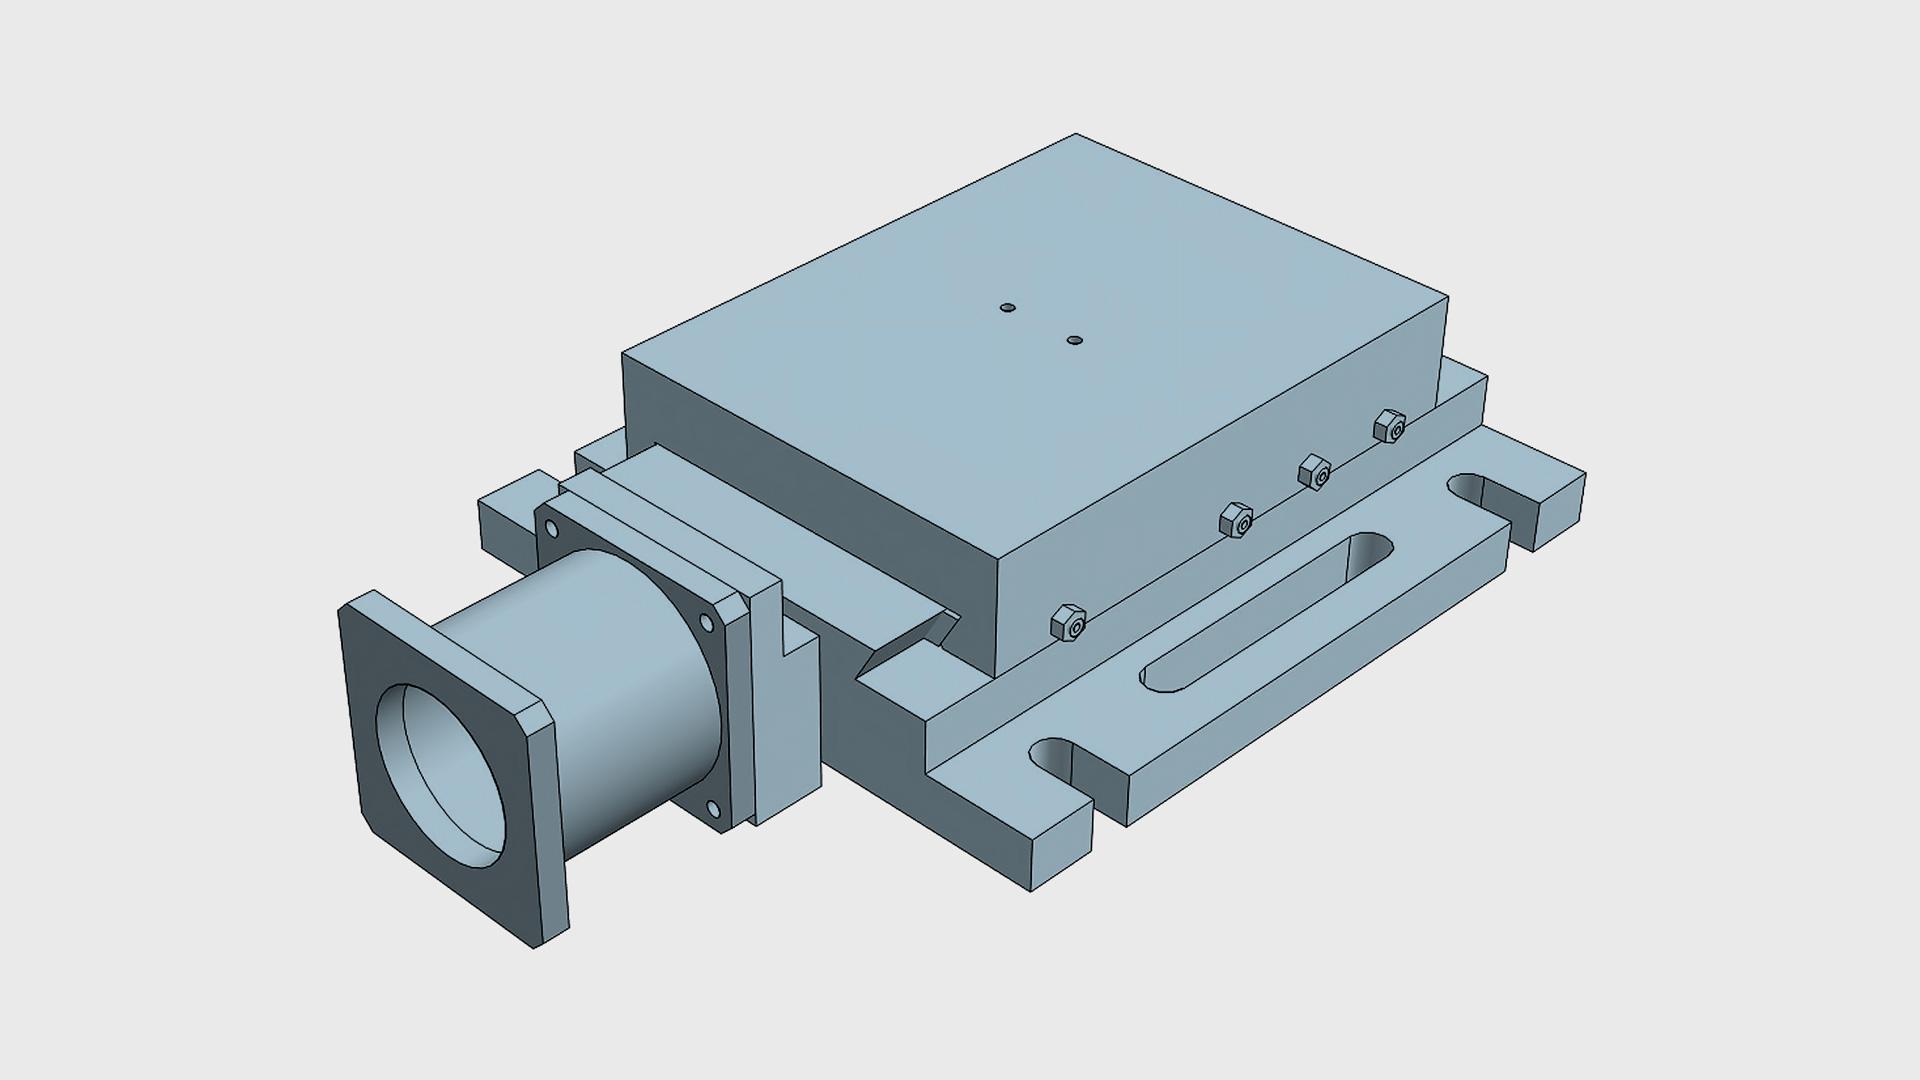 NK Automatic X slide unit (heavy loads)